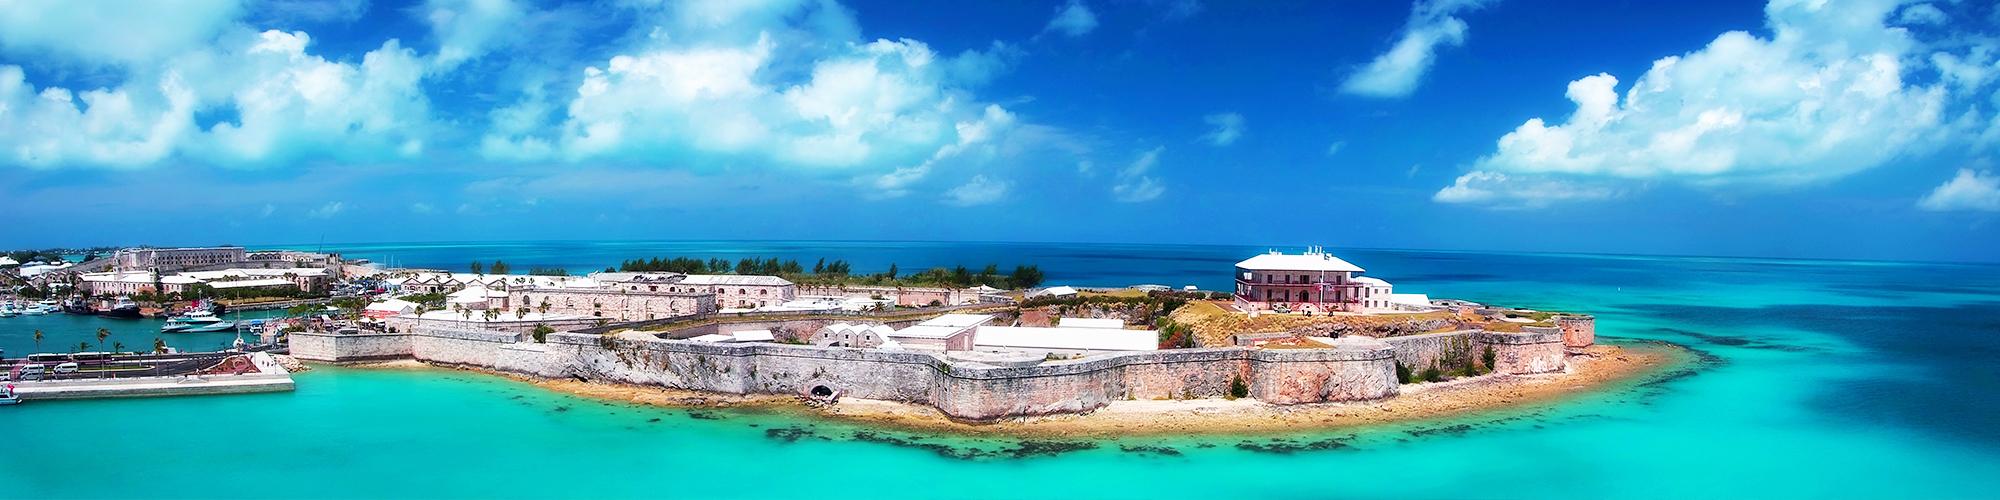 Bermuda cruise deals best cruises to bermuda - Bermuda Cruise Deals Best Cruises To Bermuda 15